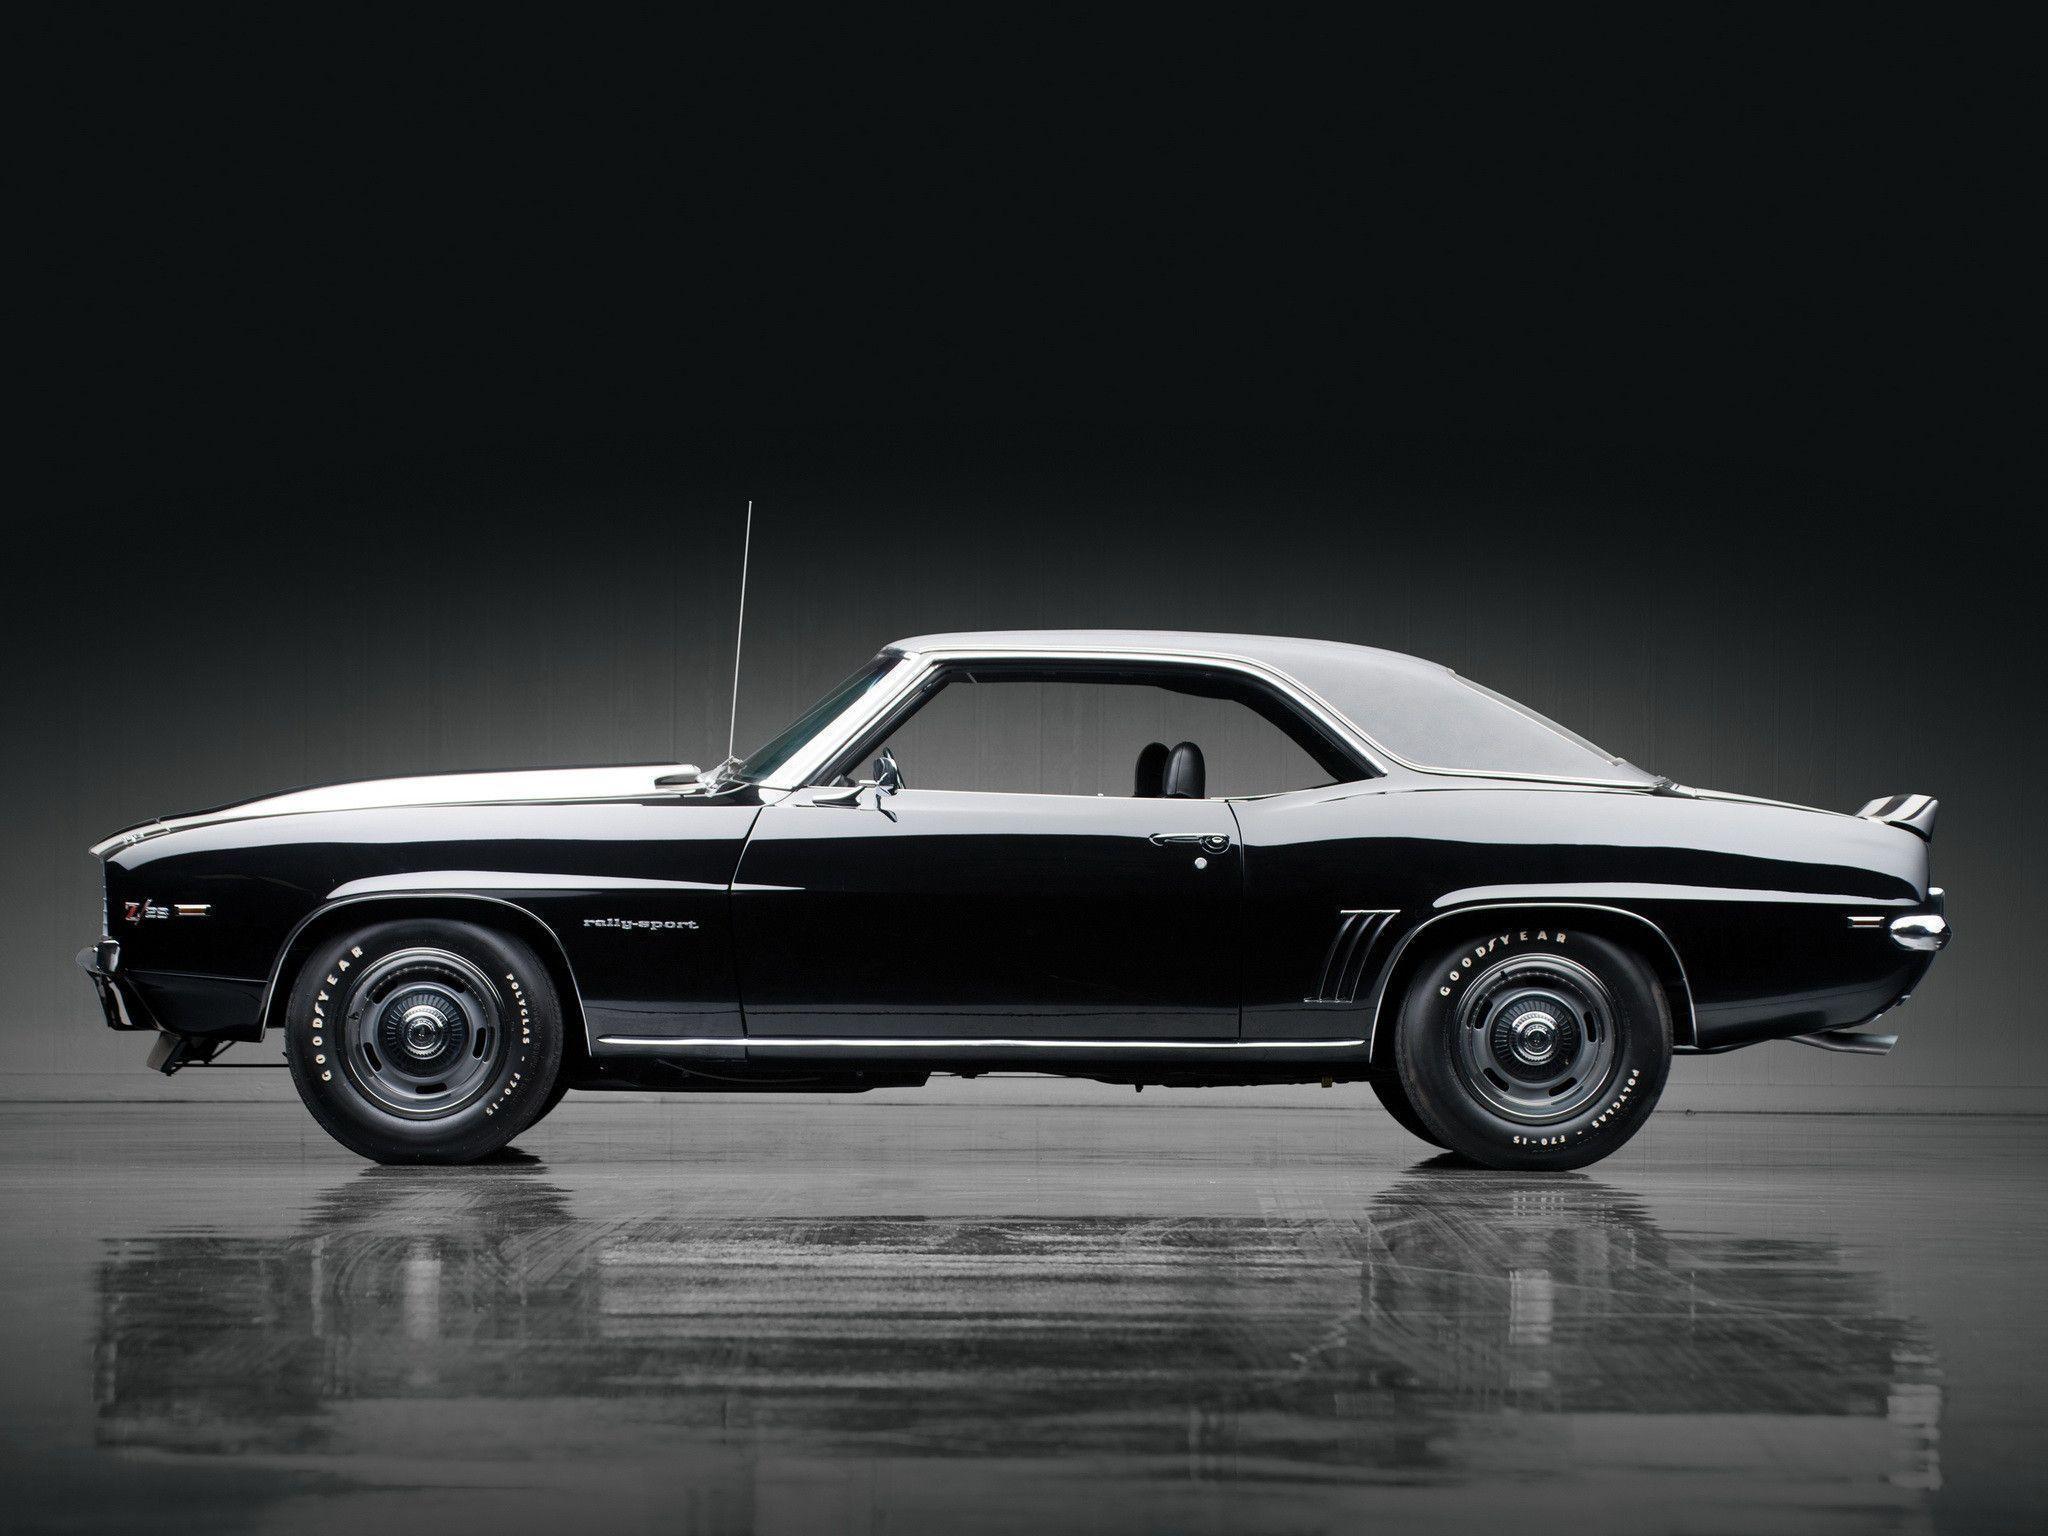 69 Camaro Wallpapers -...1969 Camaro Hd Wallpaper